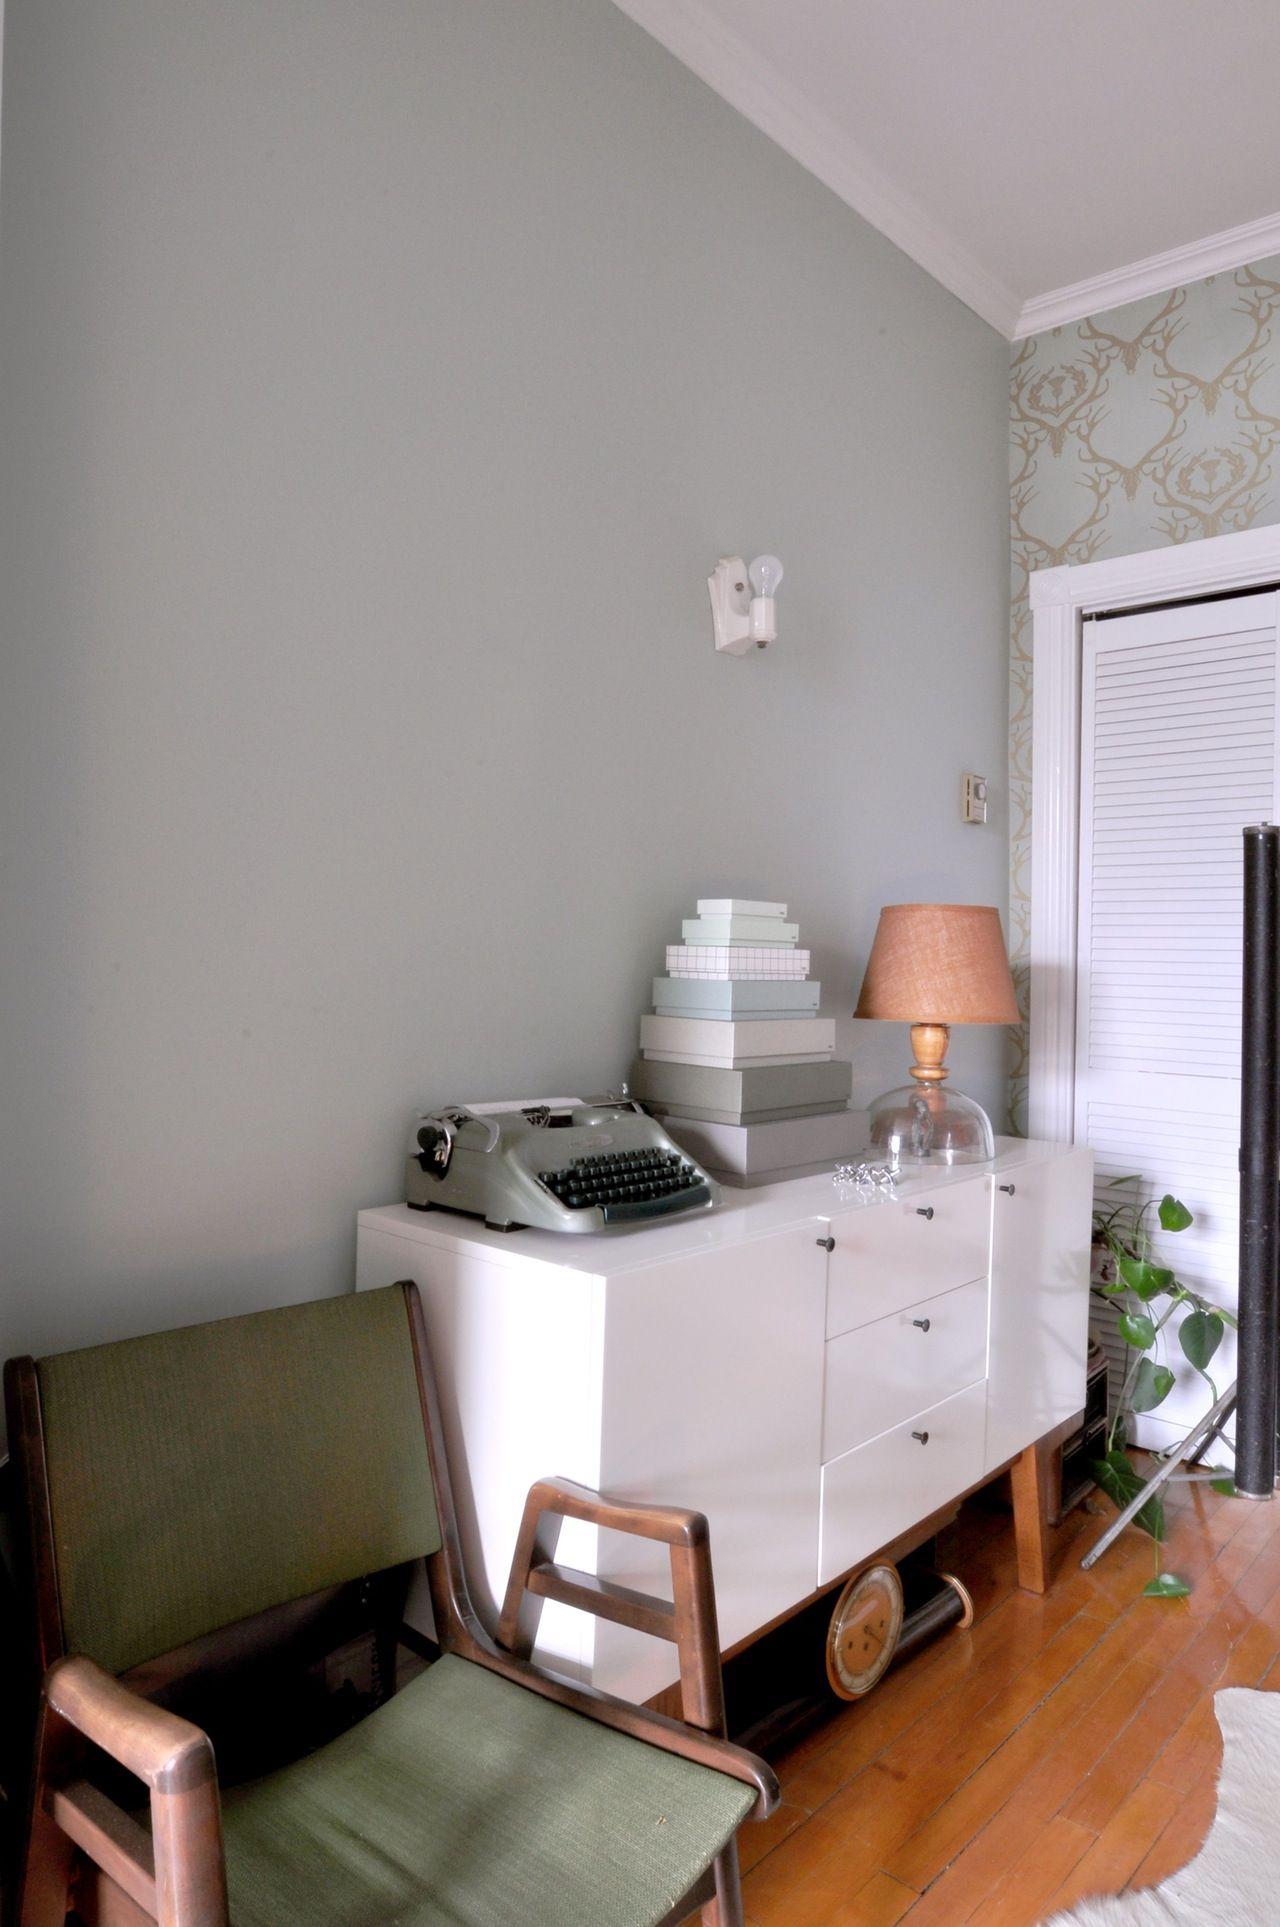 Asombroso Apartamento Estera Cocina Terapia Festooning - Ideas de ...